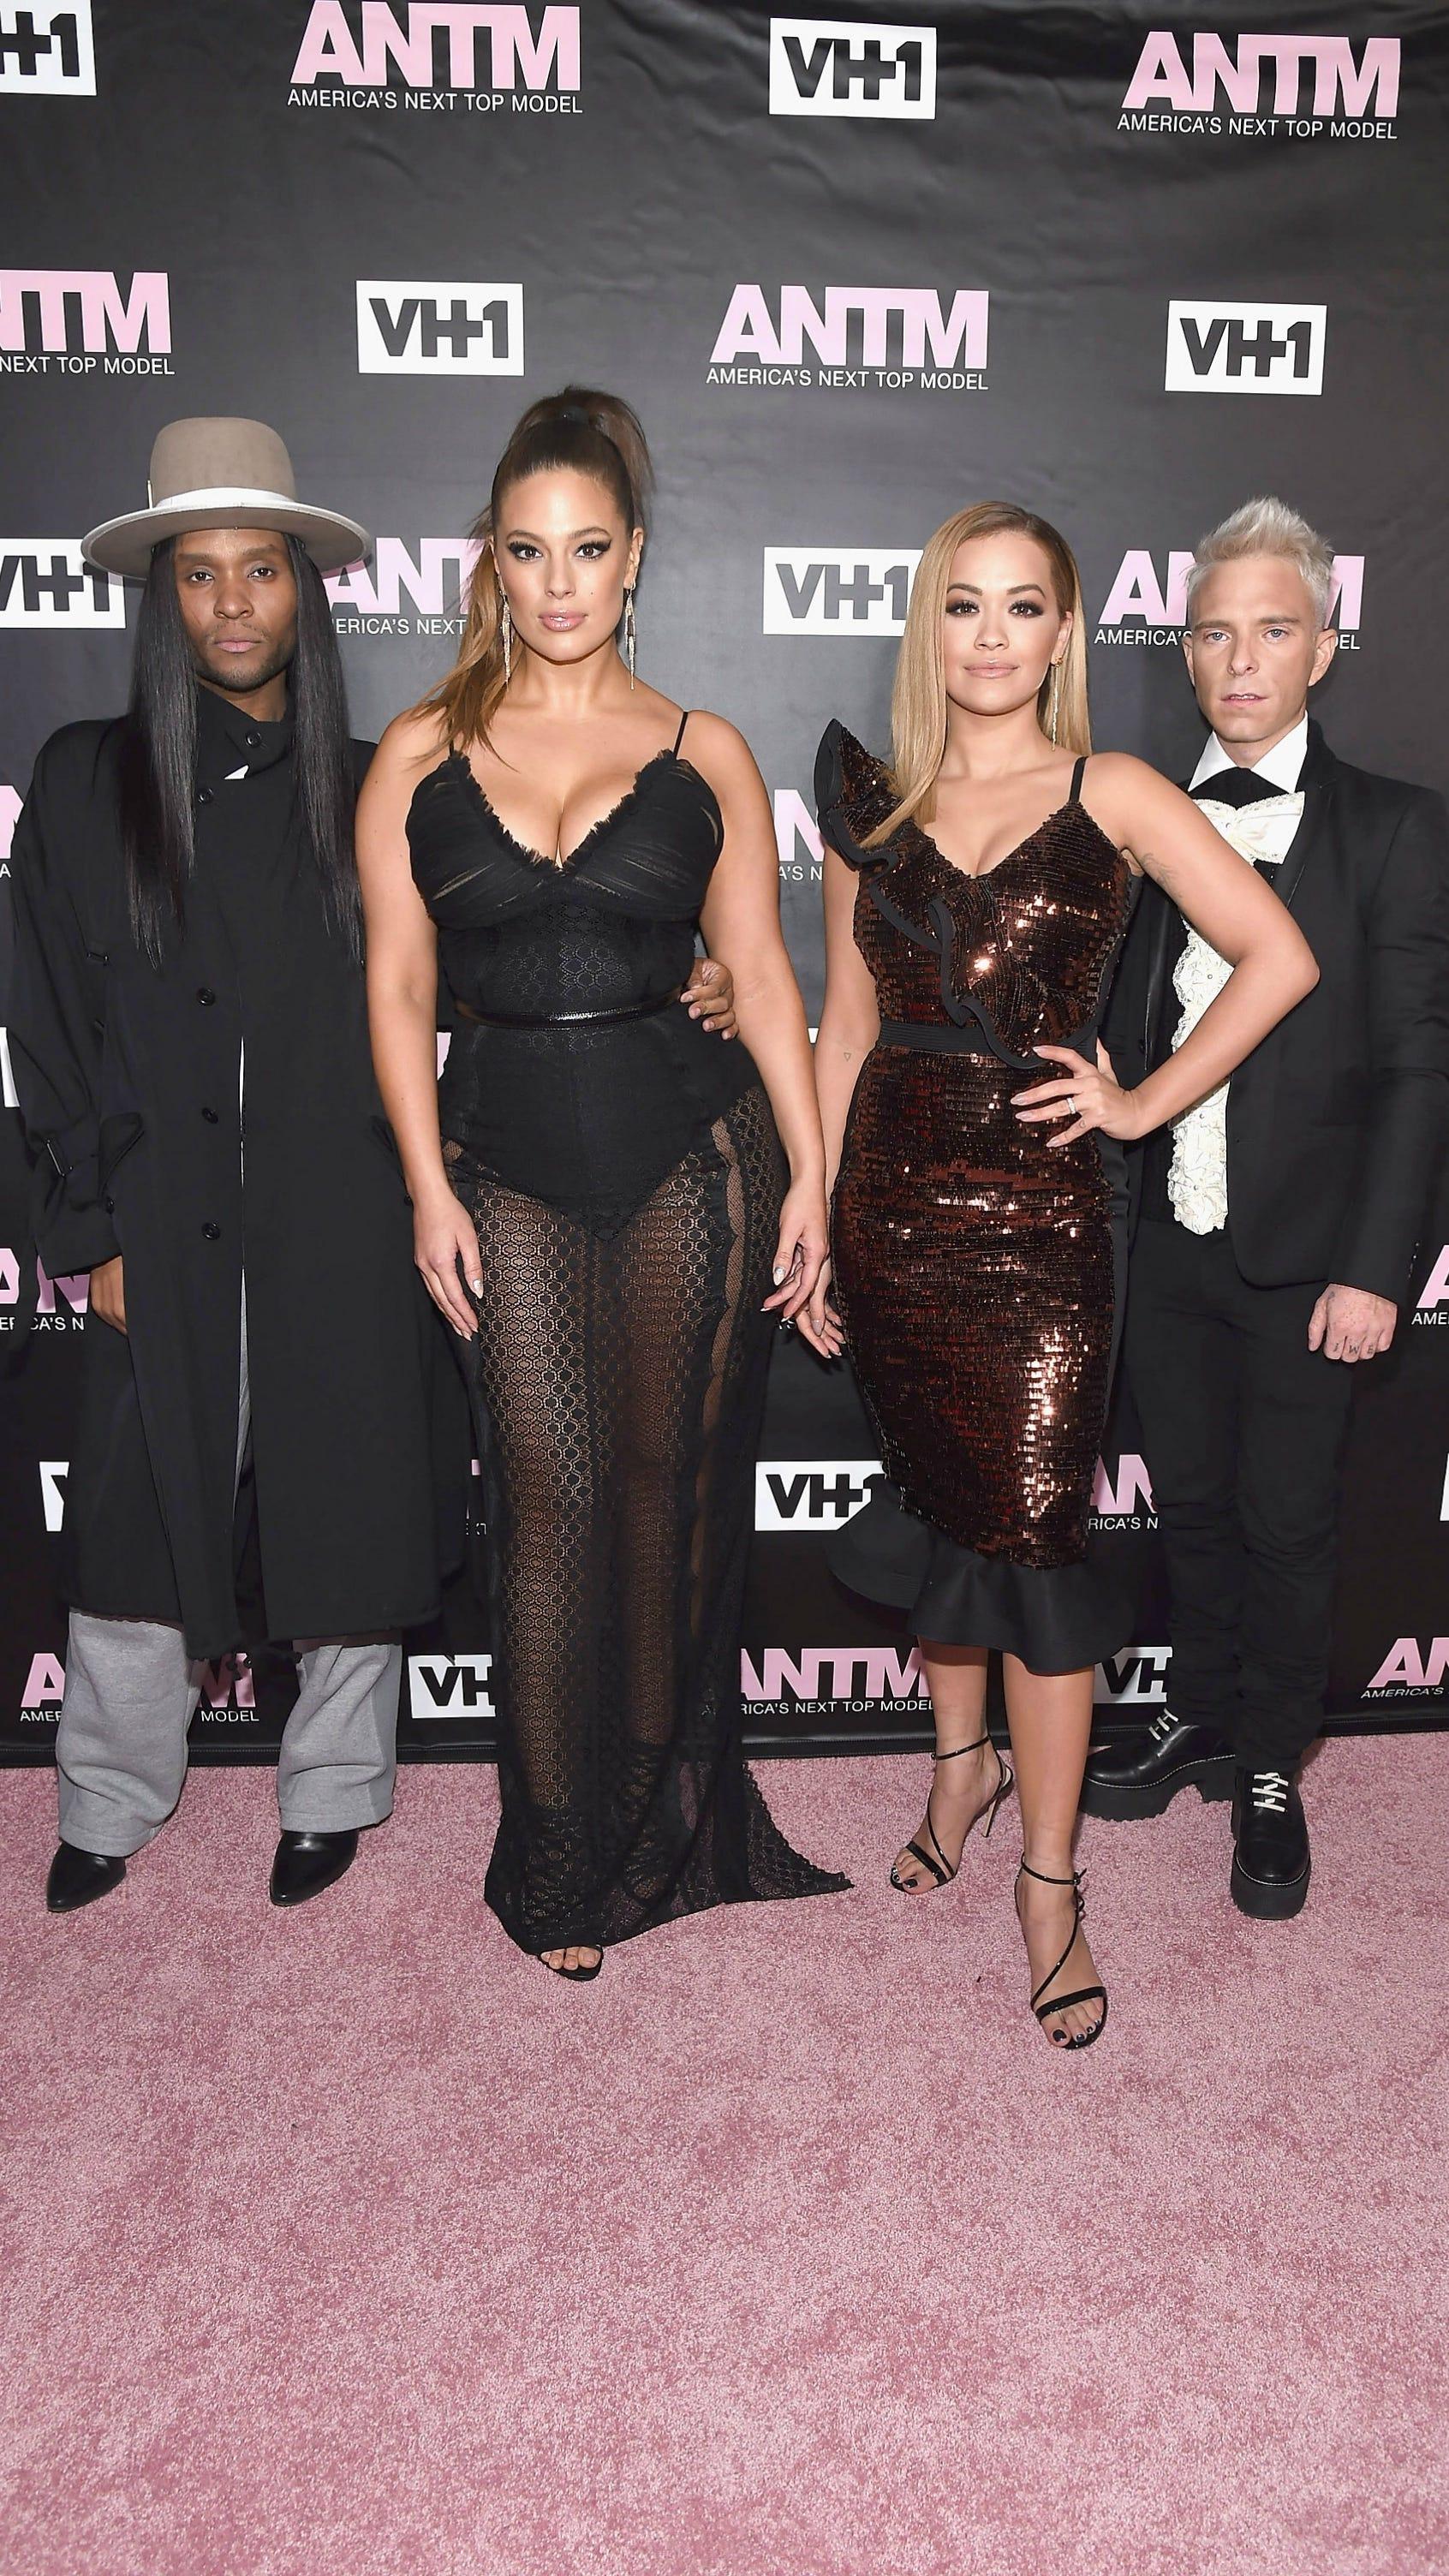 ¿Cuánto mide Rita Ora? - Real height Image